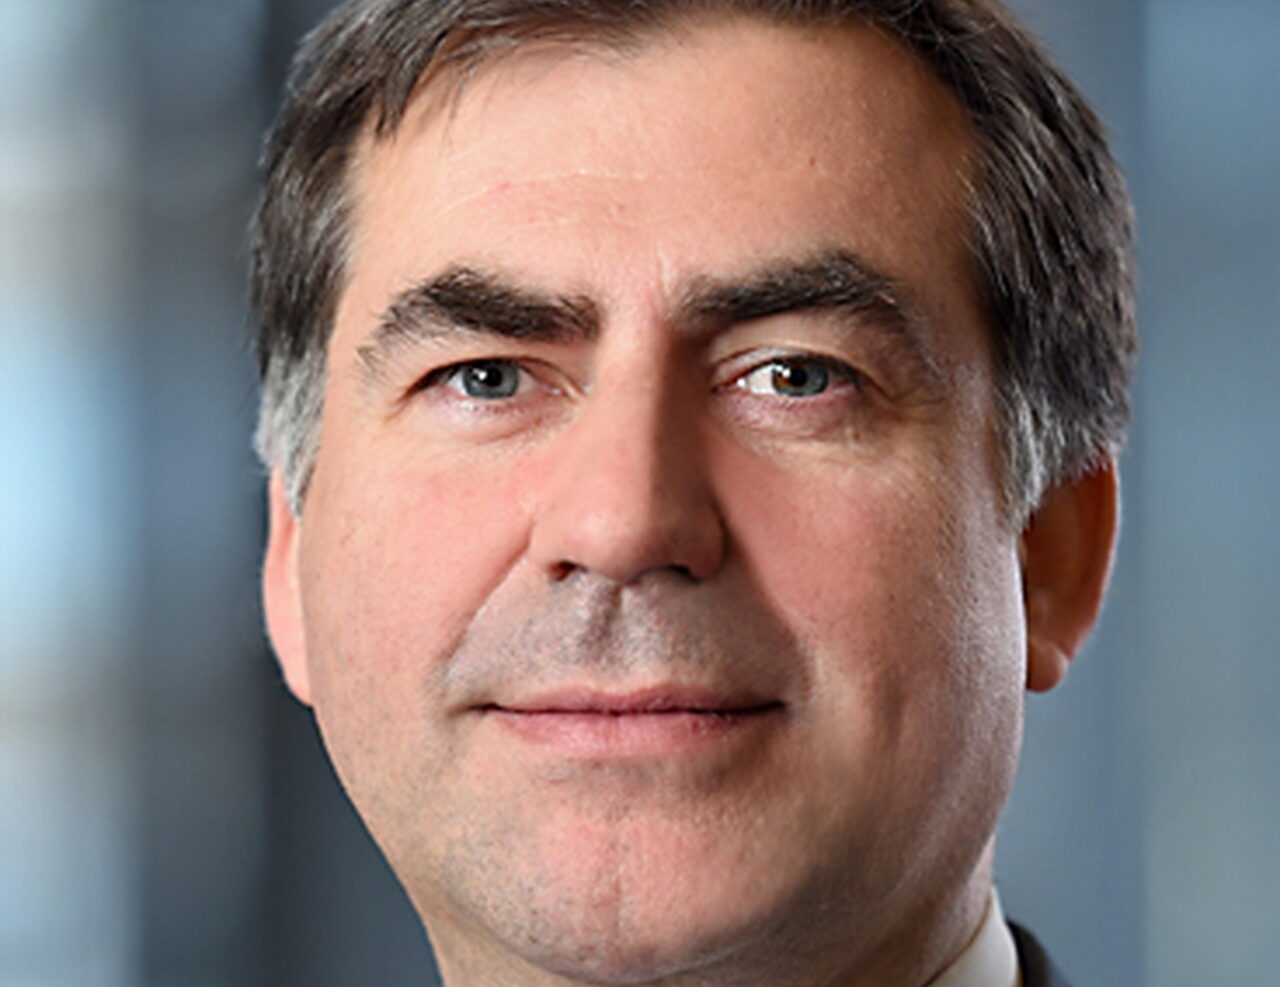 https://intelligent-investors.de/wp-content/uploads/2021/05/Markus-Banna-Aberdeen-Standard-Investments_2-1280x987.jpg